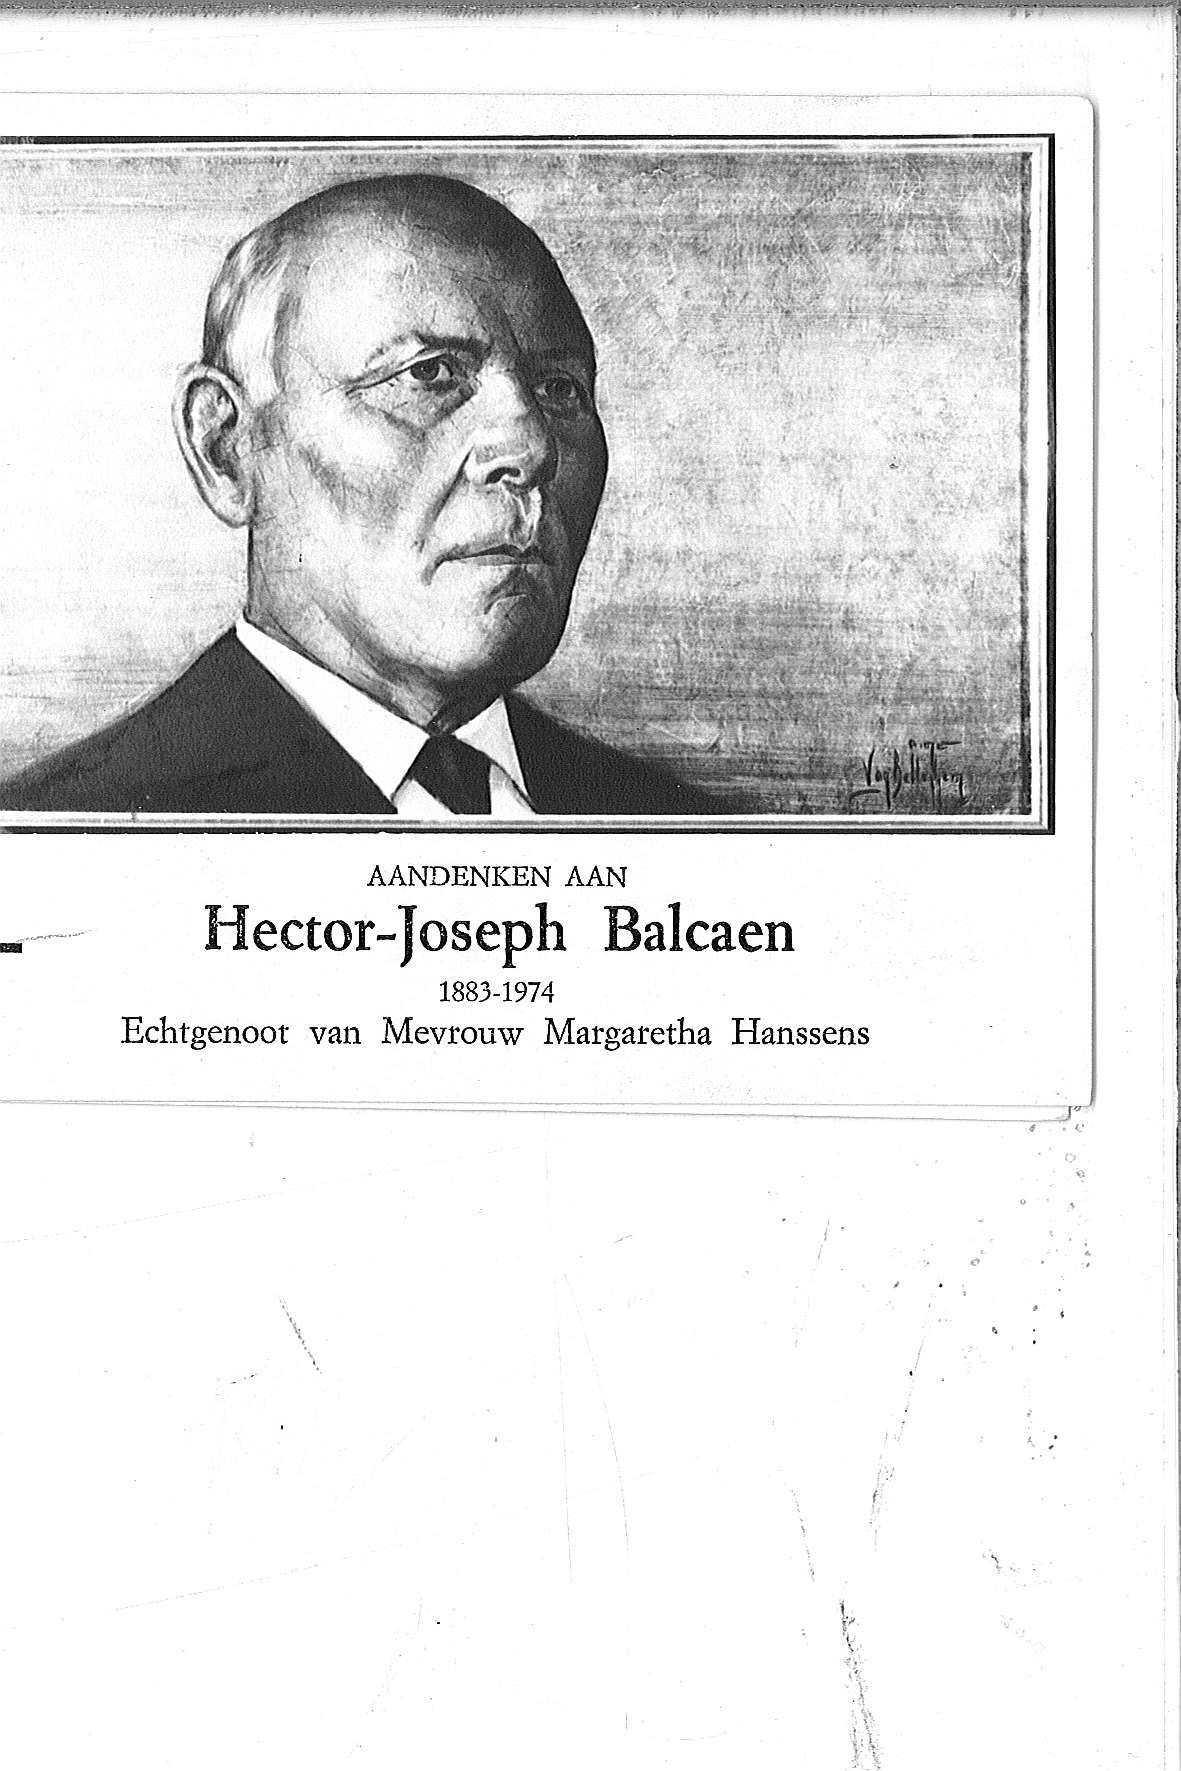 Hector-Joseph(1974)20130823095959_00081.jpg